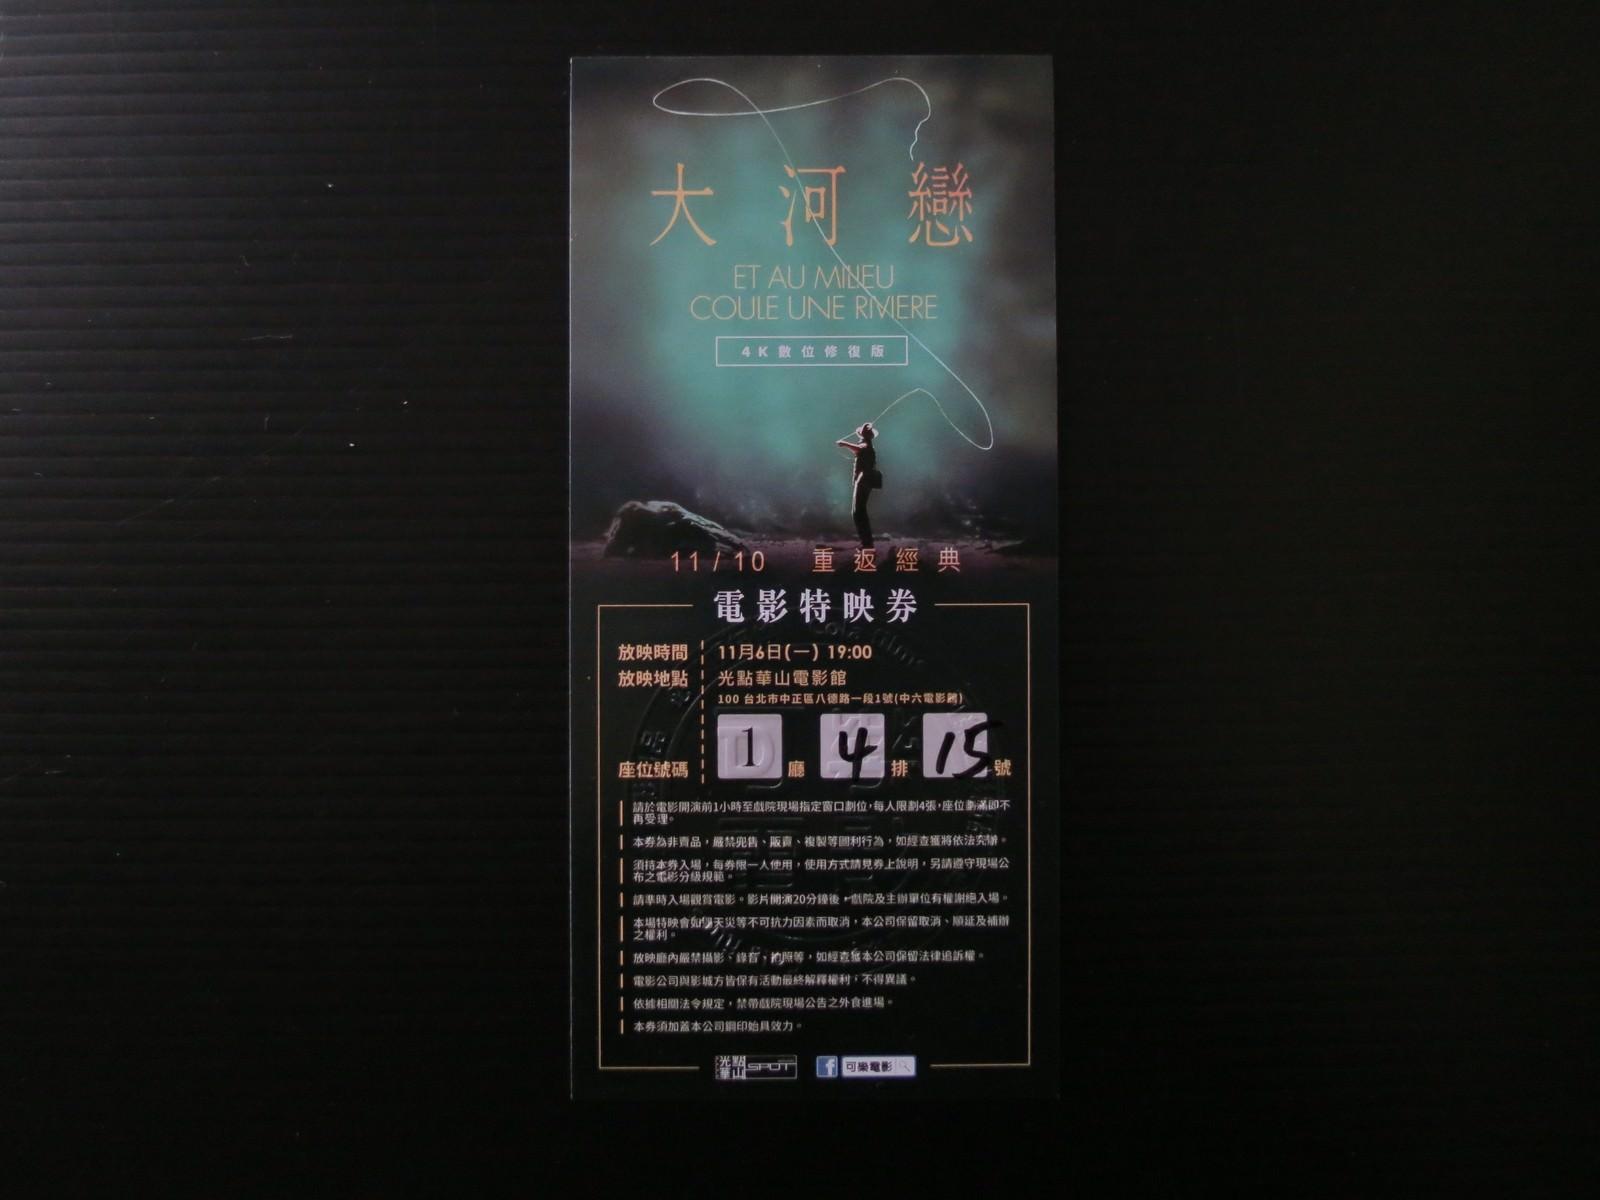 Movie, A River Runs Through It(美國, 1992年) / 大河戀(台灣) / 川流歲月(香港), 特映會電影票